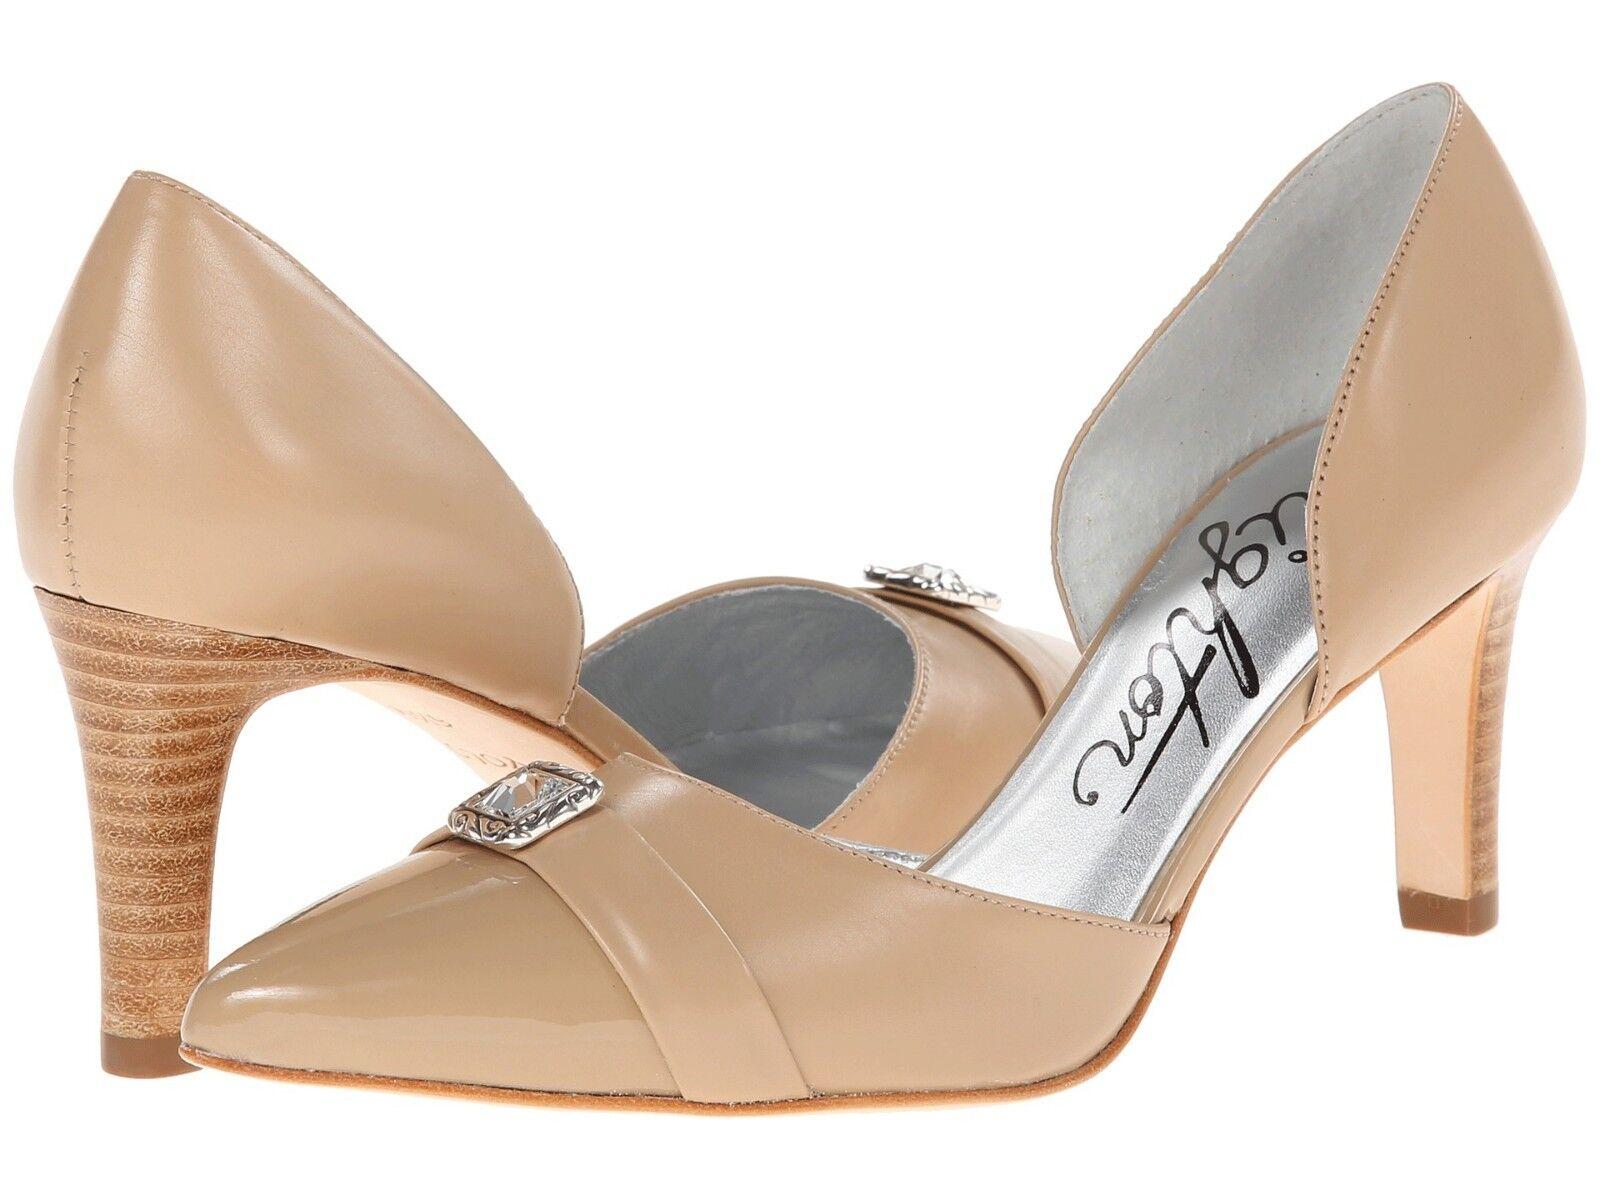 NIB Brighton Yolo Women's Size M 10 M Size Sand Beige Nude Leather Heels Pumps $228 b7033e